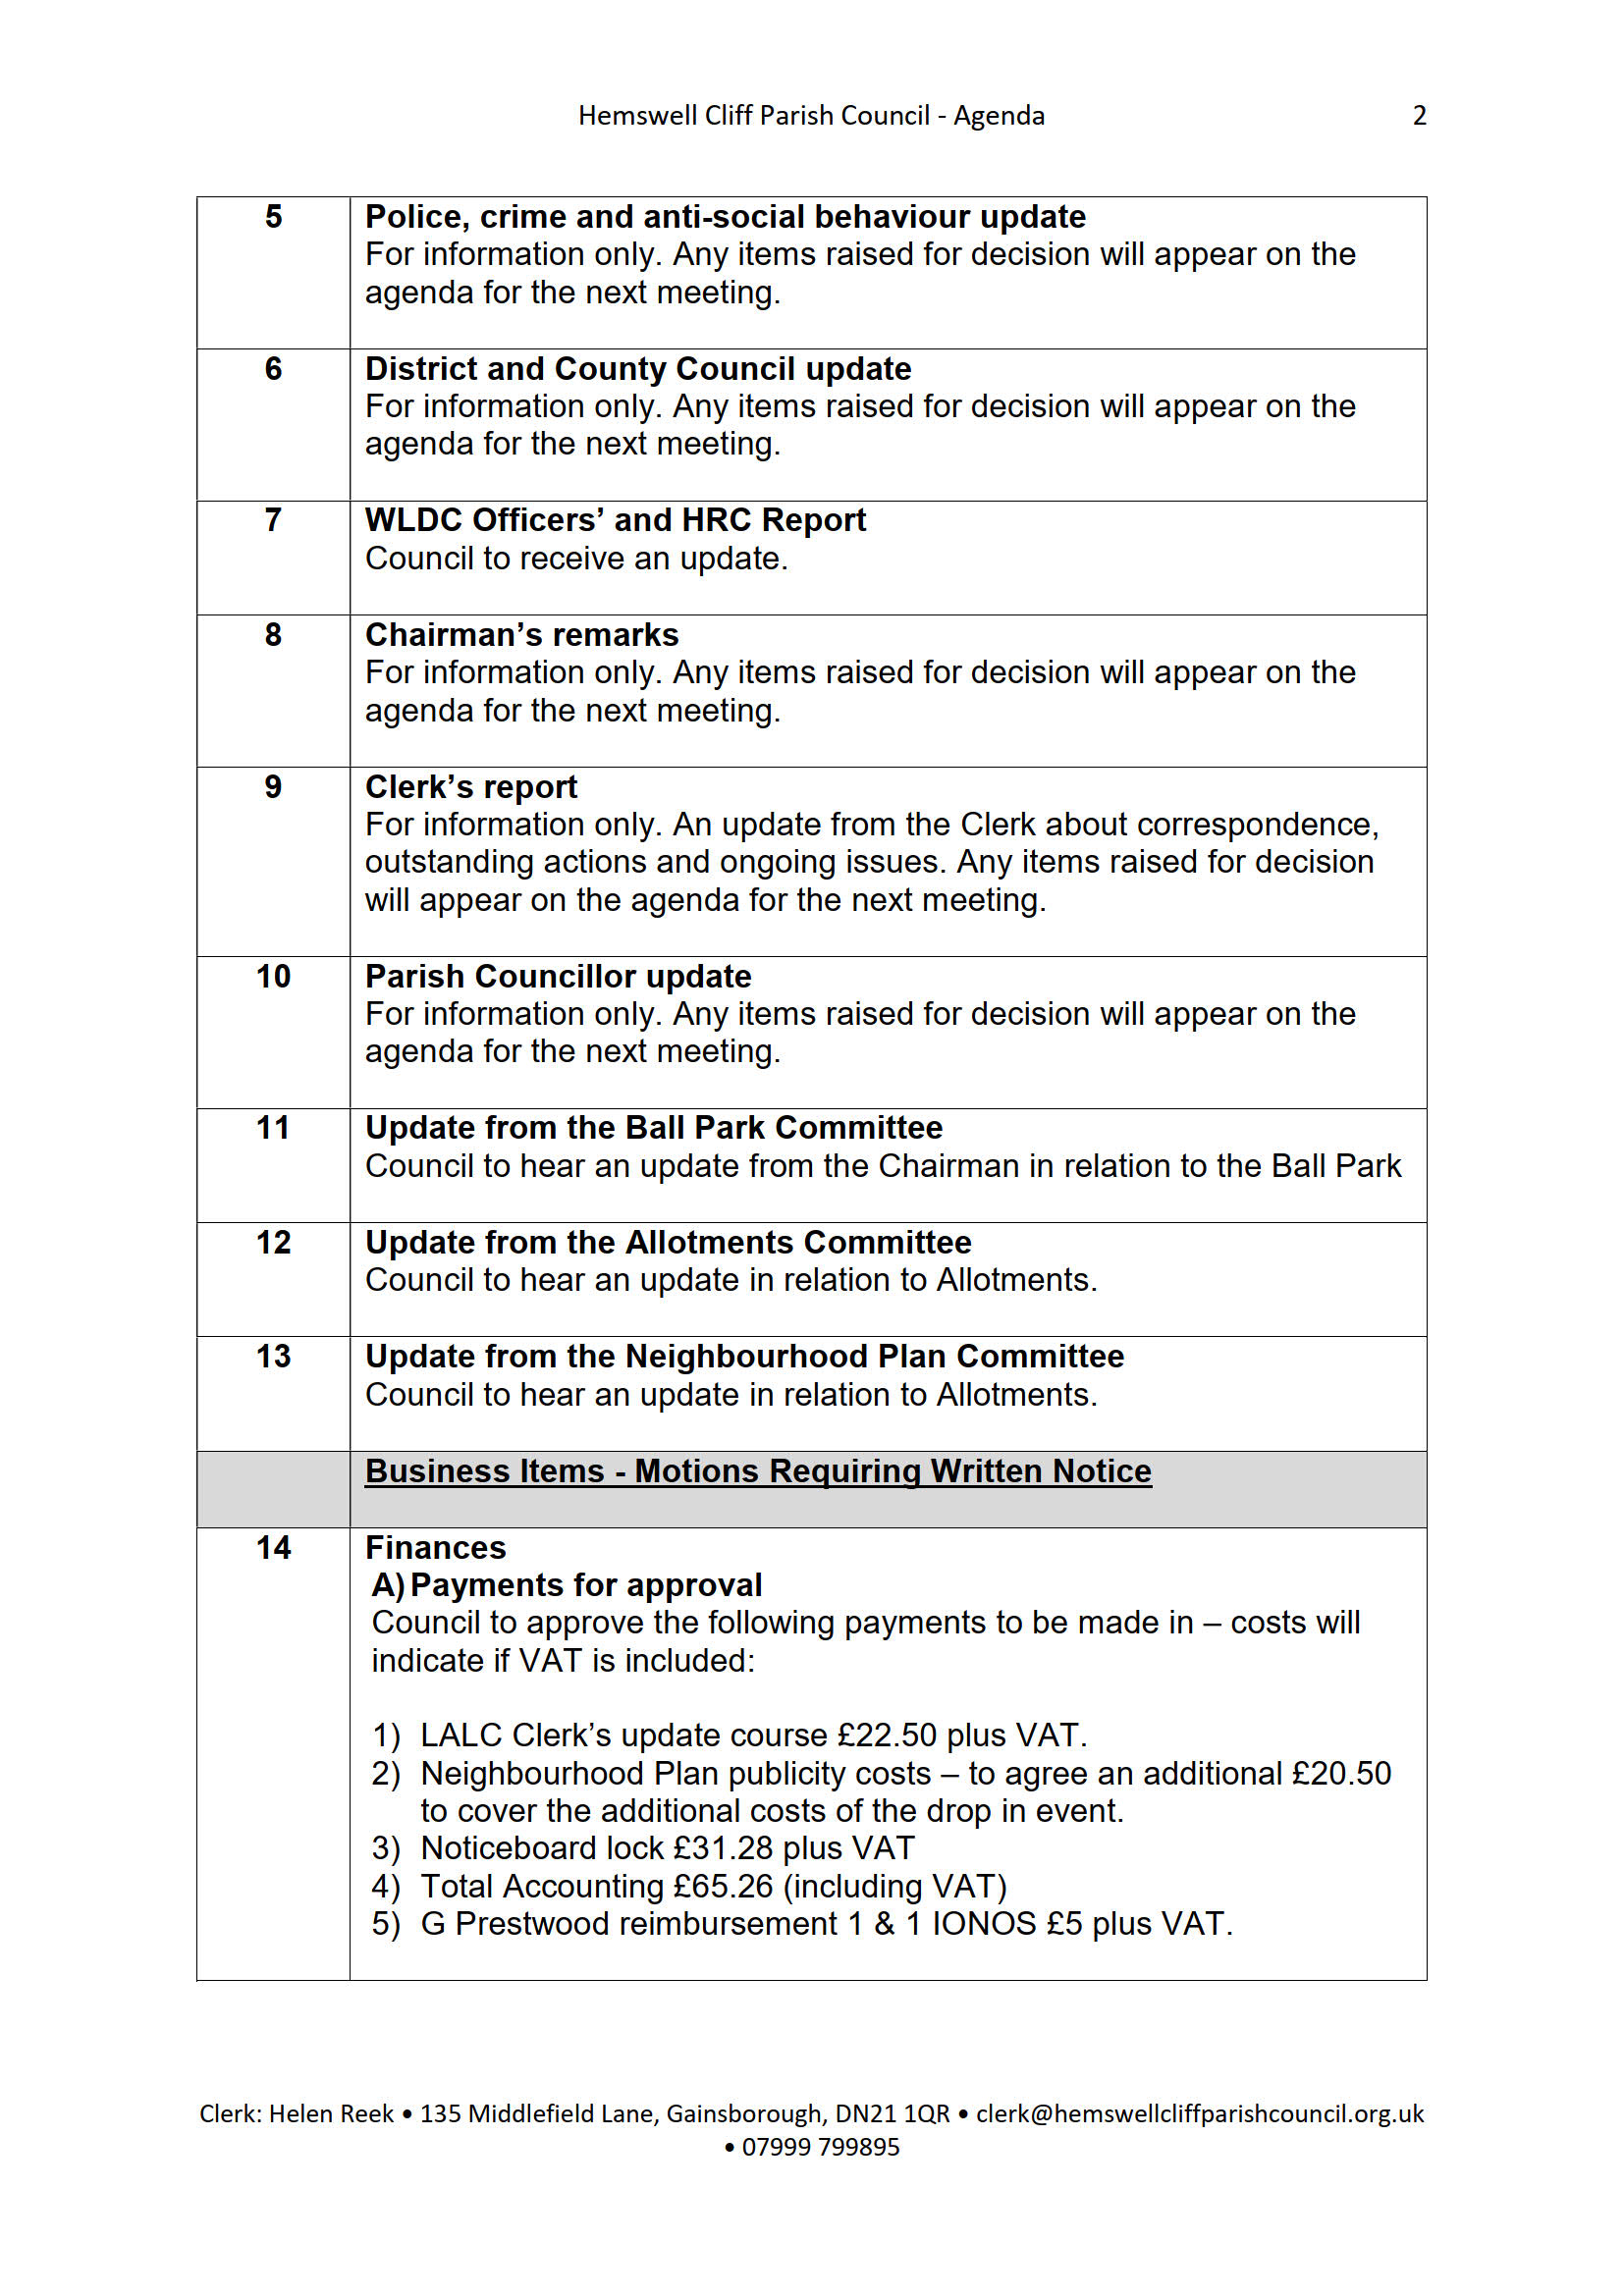 HCPC_Agenda_06.09.21_2.jpg